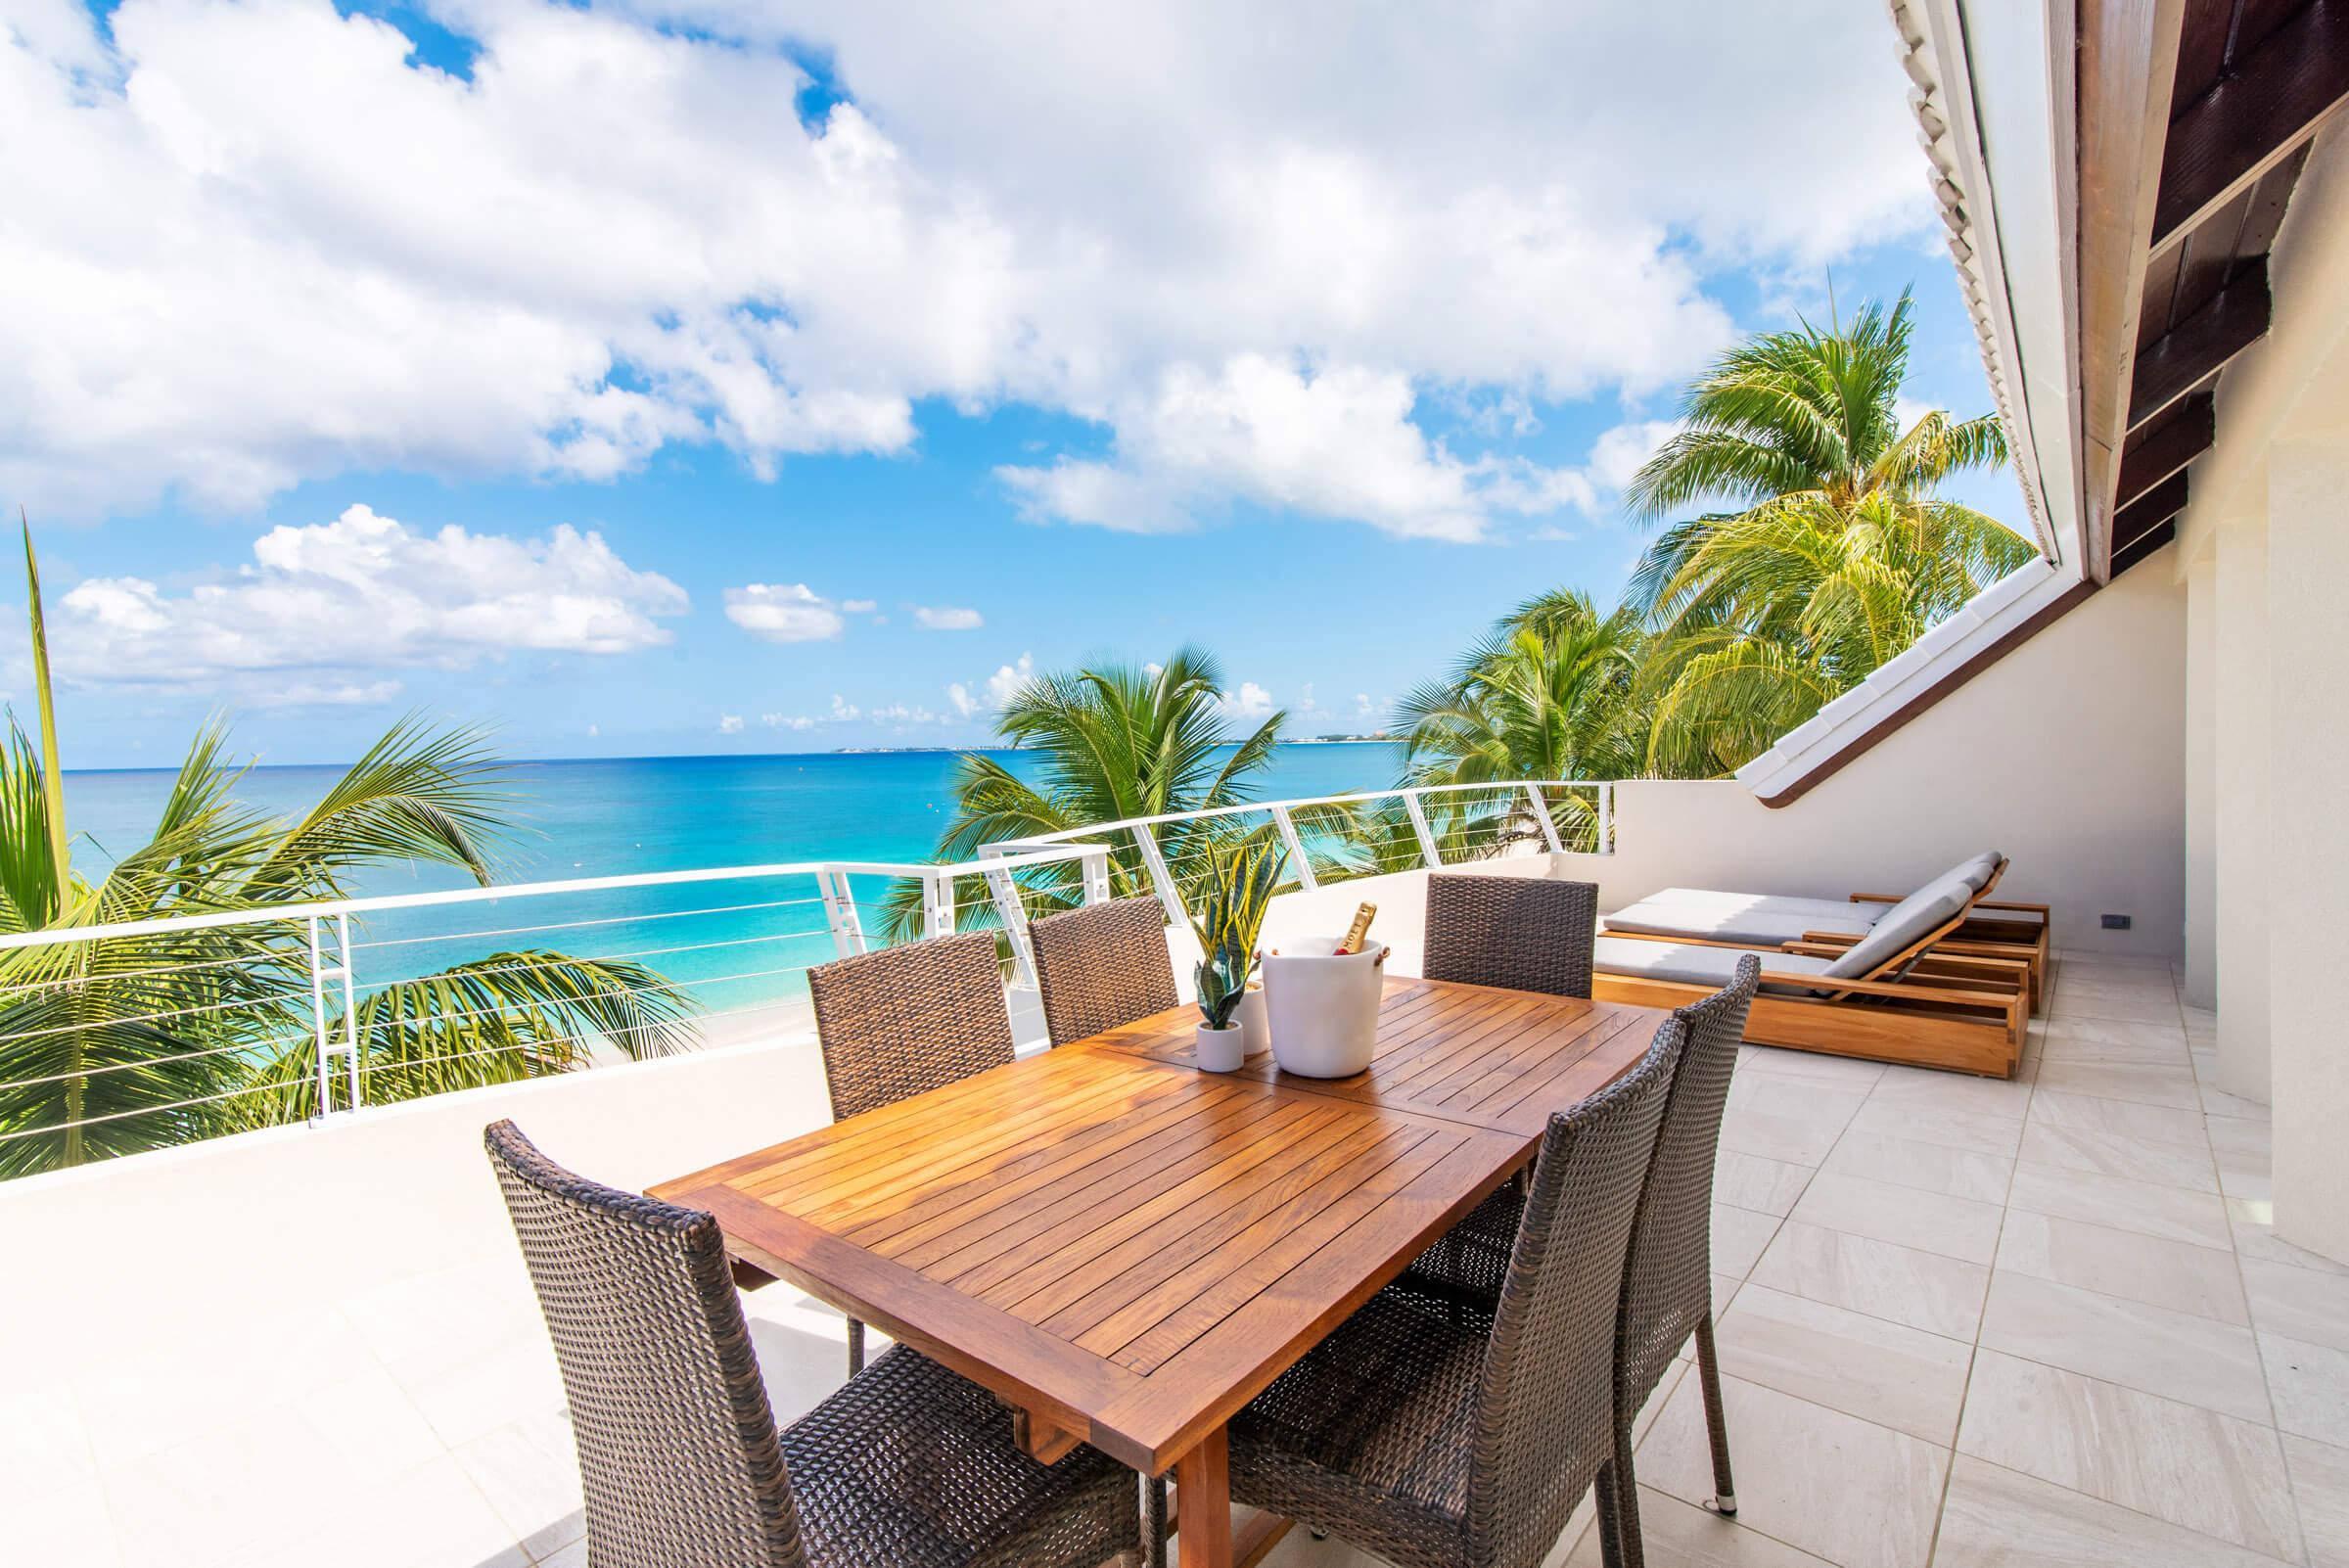 Seascape Villa Cayman Islands Grand Cayman Family Beachfront Luxury Caribbean Vacation Rental